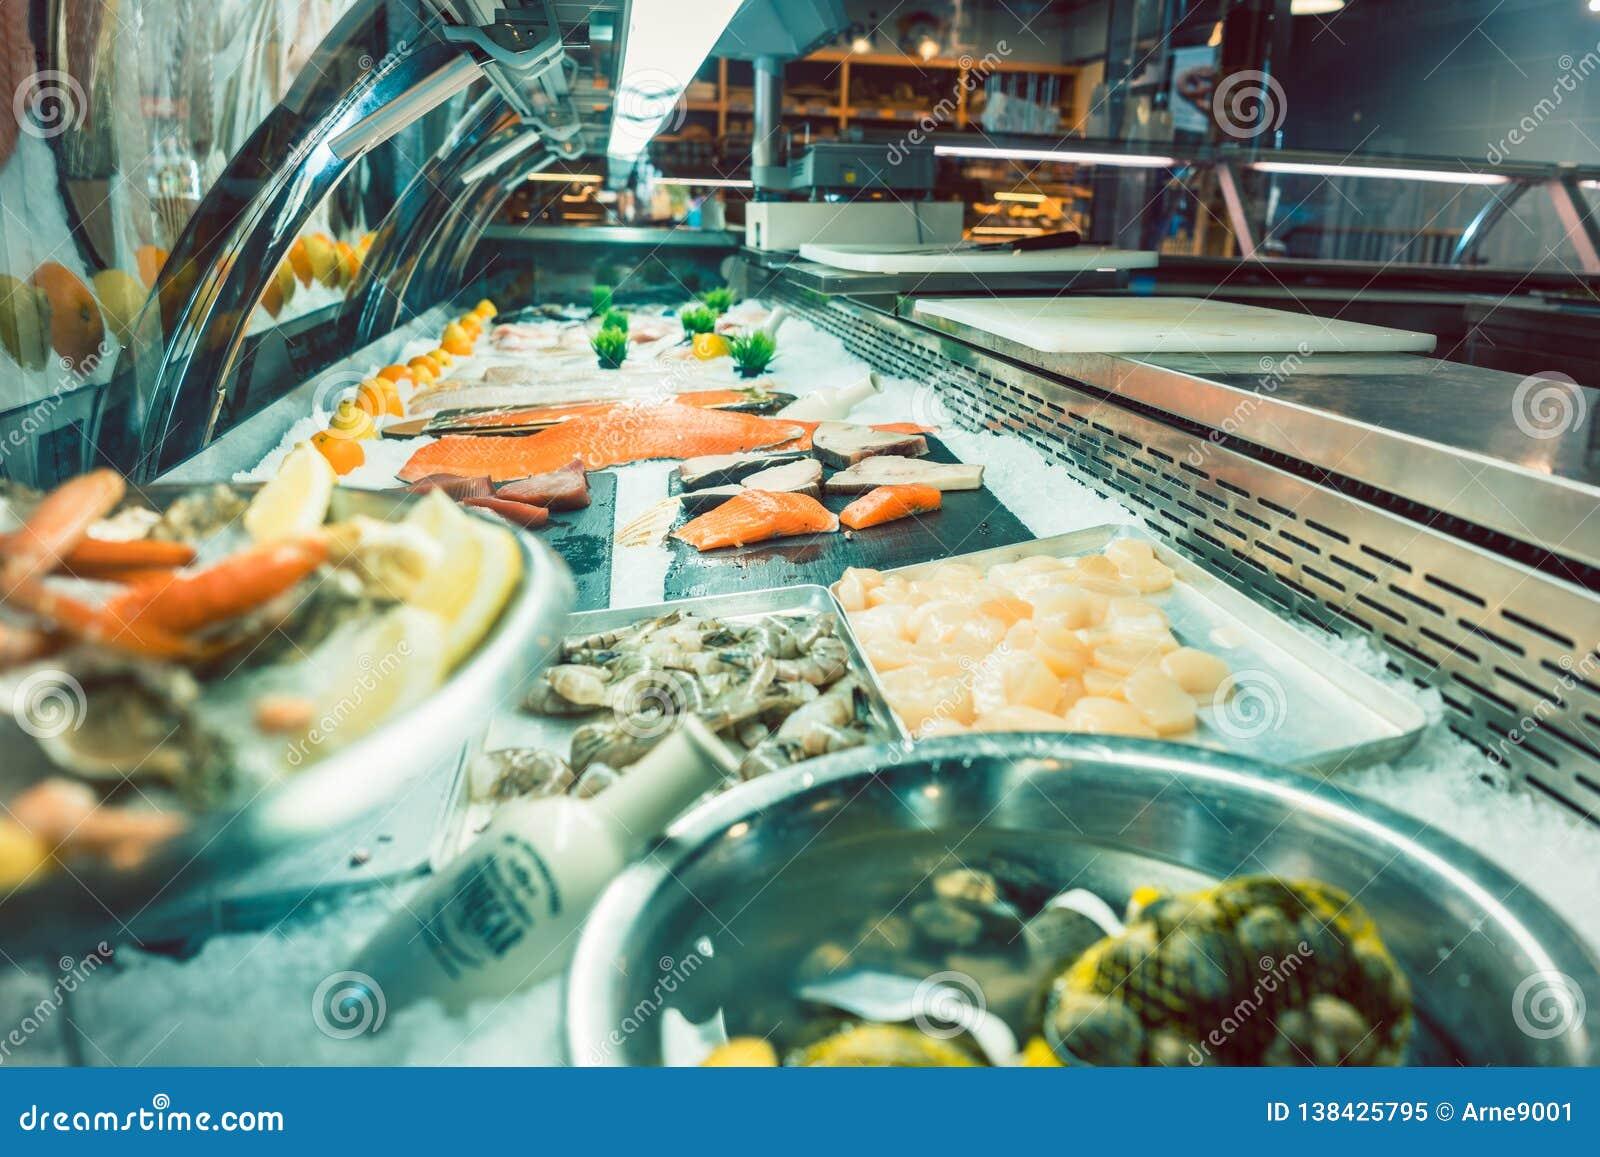 Fresh raw salmon fillet in the freezer of a modern restaurant